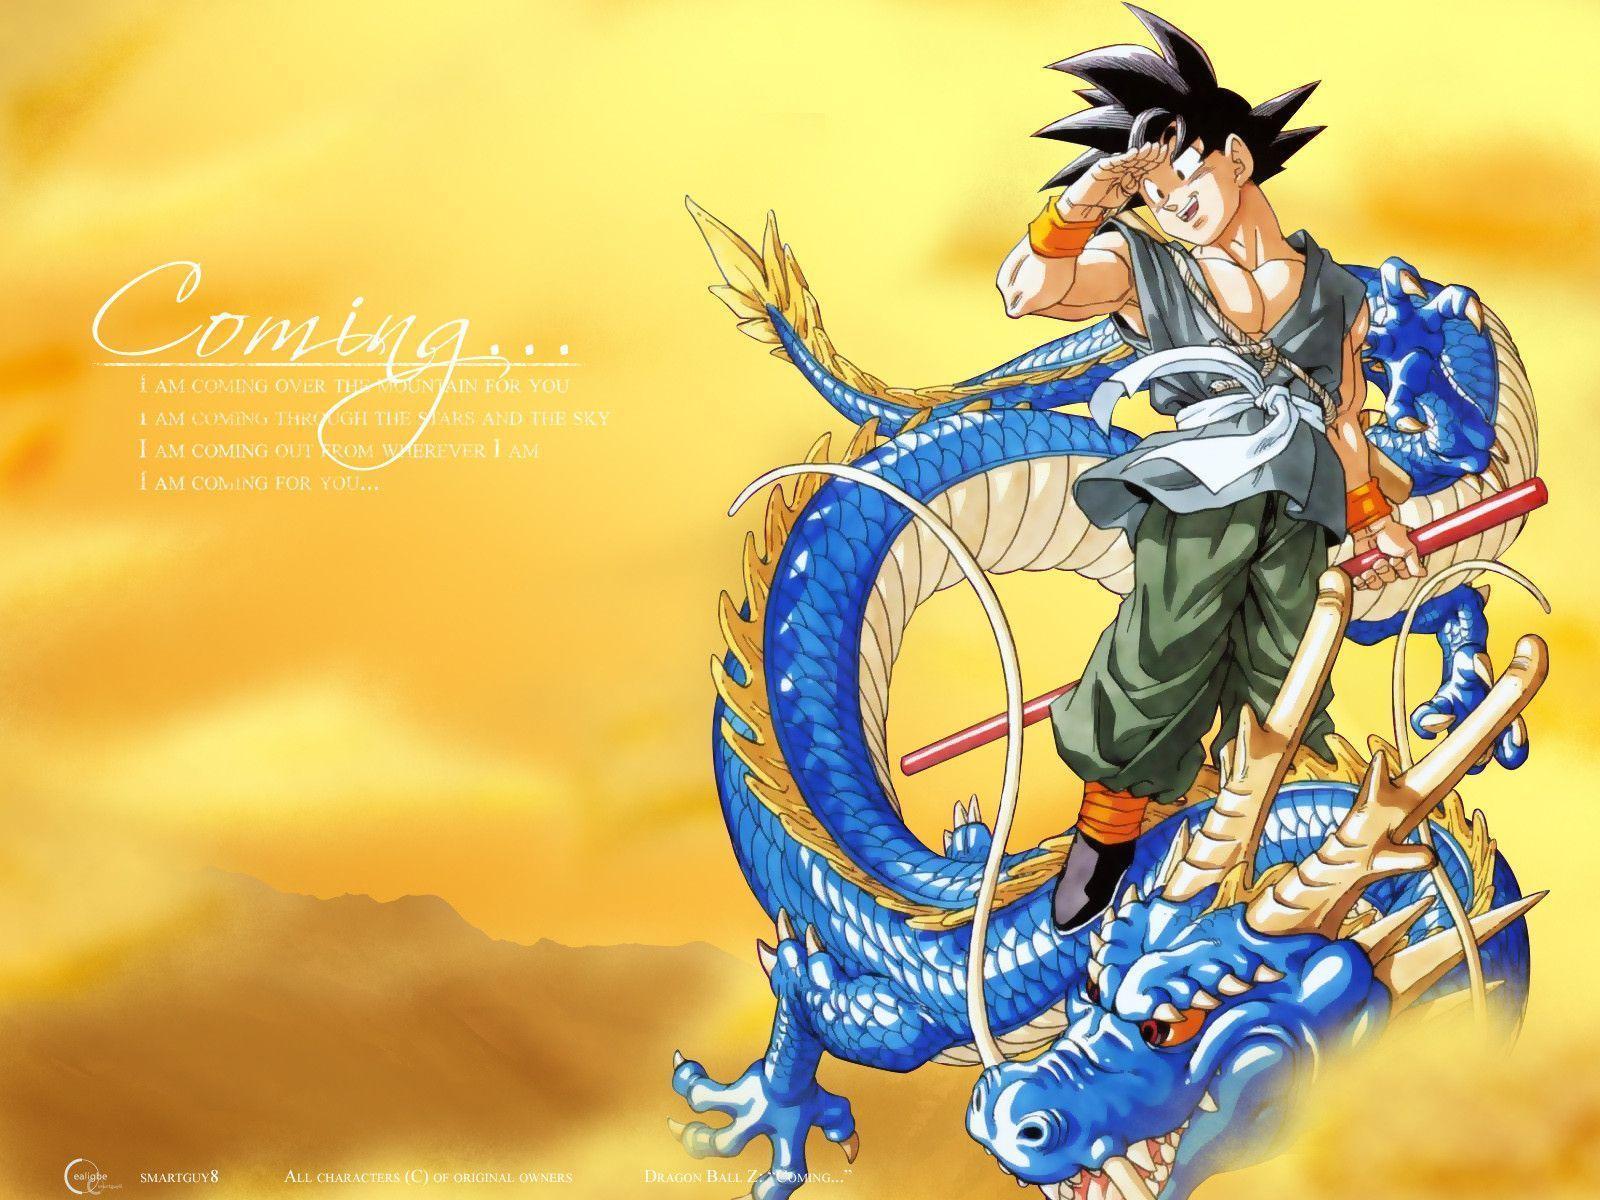 wallpapers de goku en hd - Taringa!